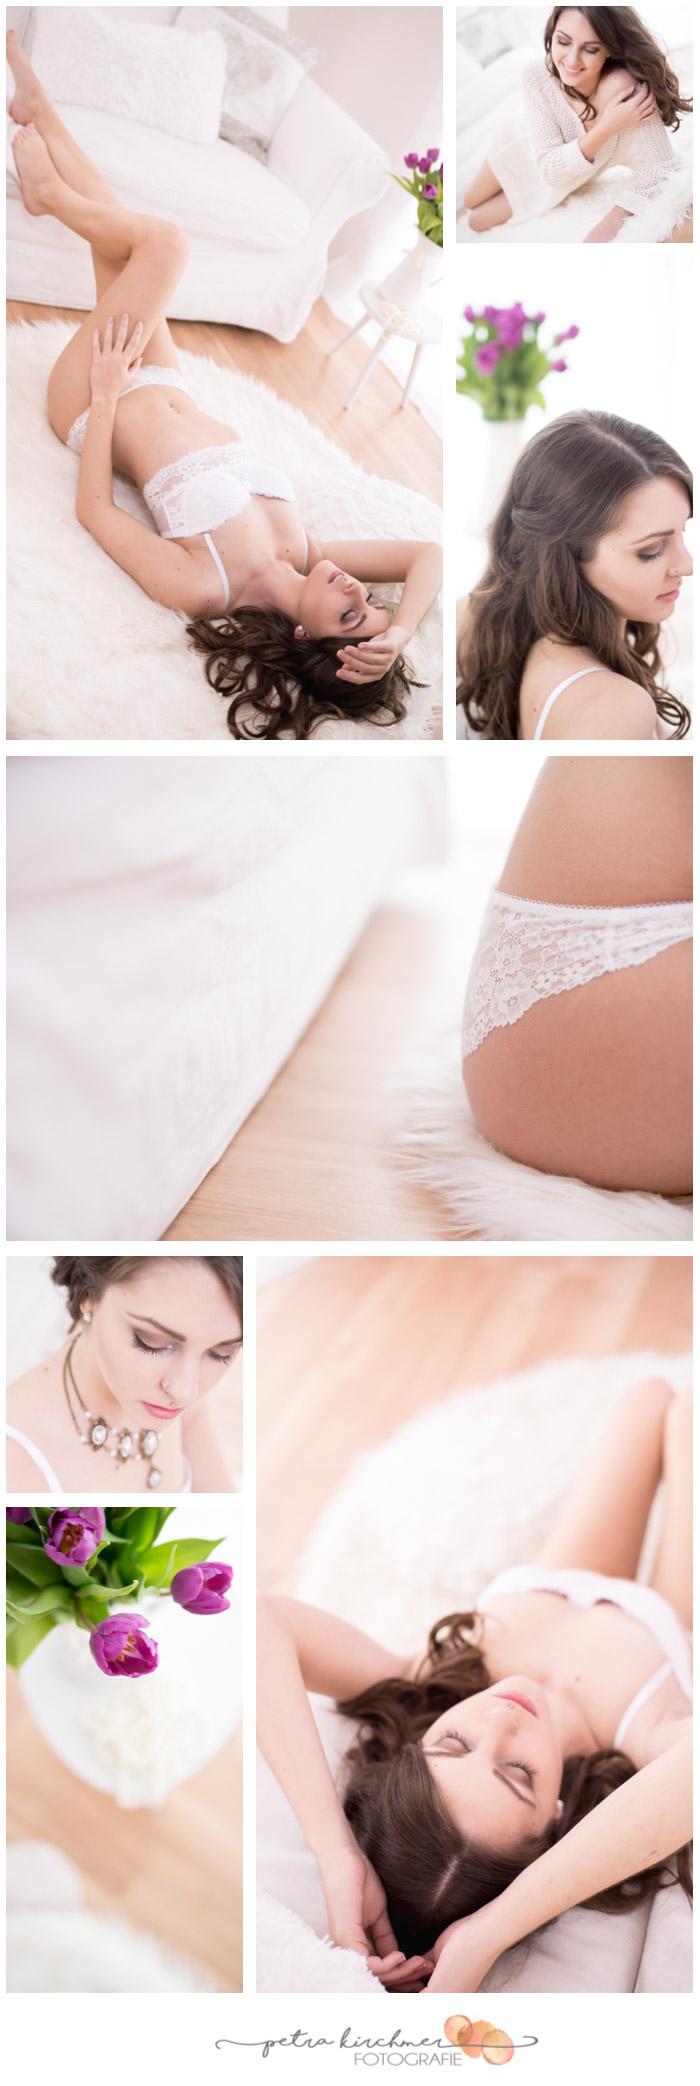 erotische Fotografie pfalz boudoir